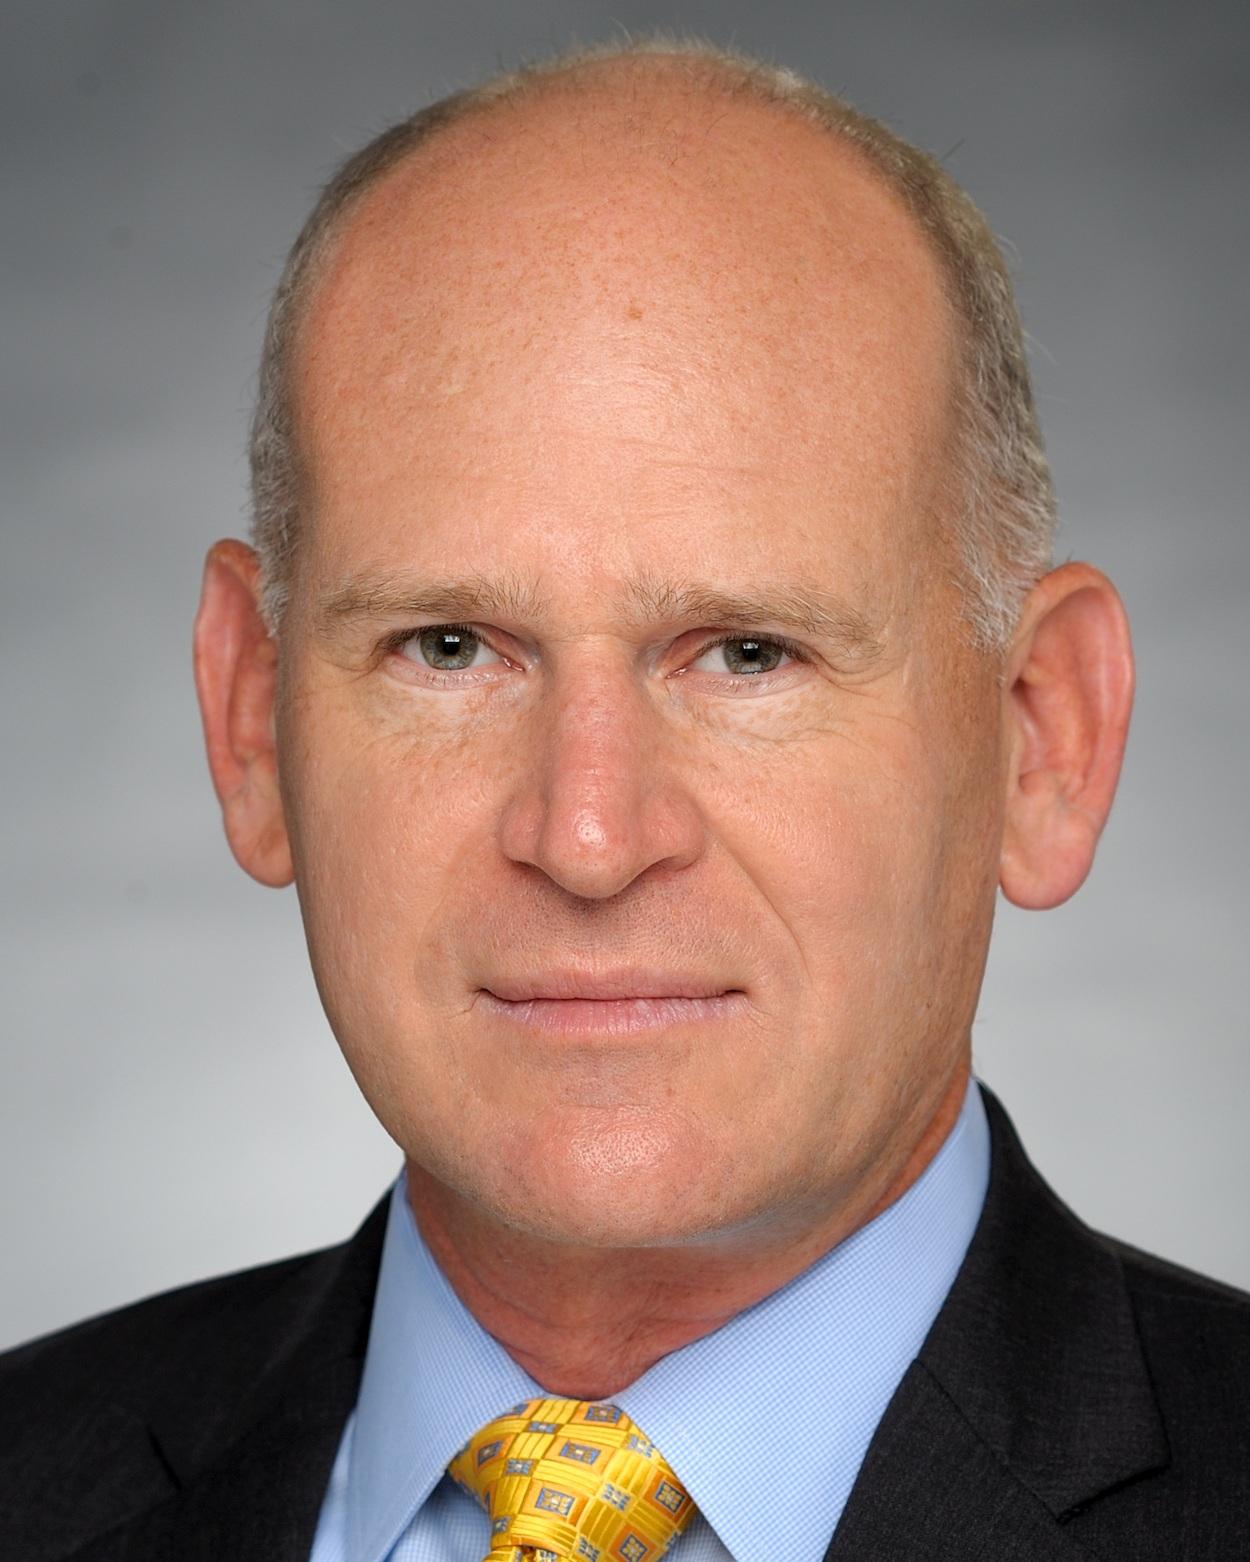 Allen MillerCEO & Principal - COPE Health Solutions